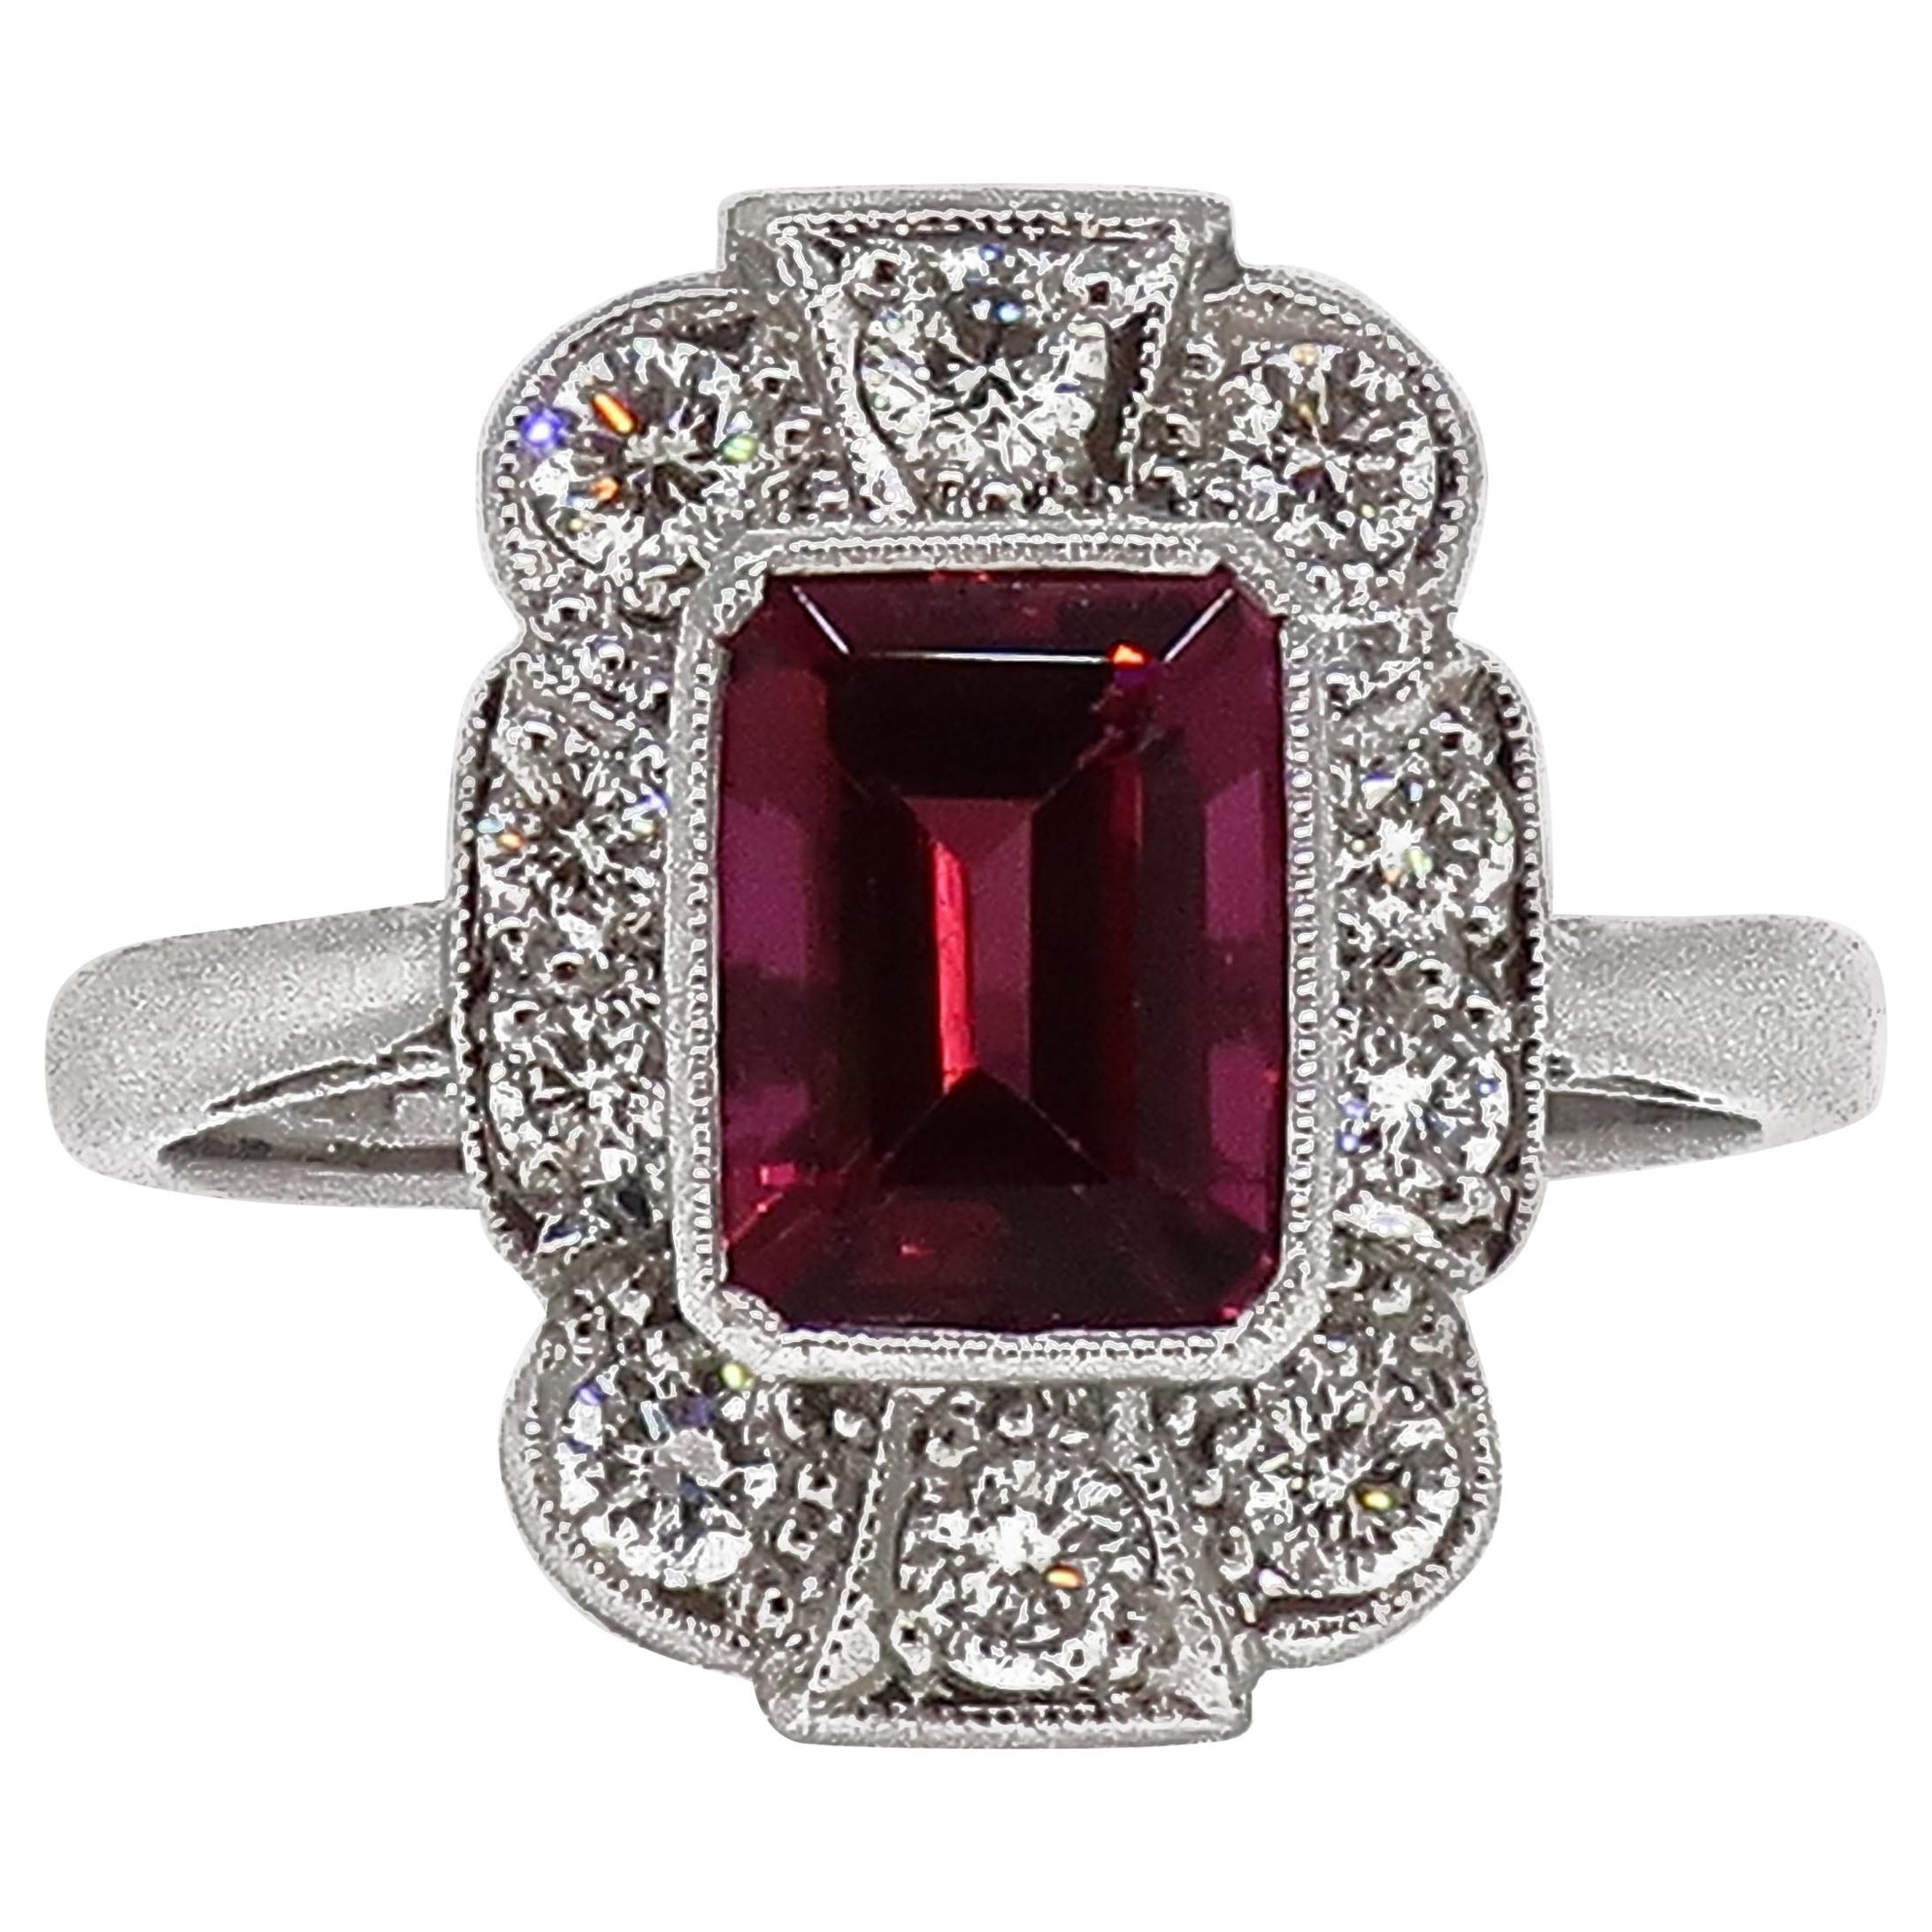 18 Karat White Gold Rubellite Tourmaline and Diamond Art Deco Style Cluster Ring